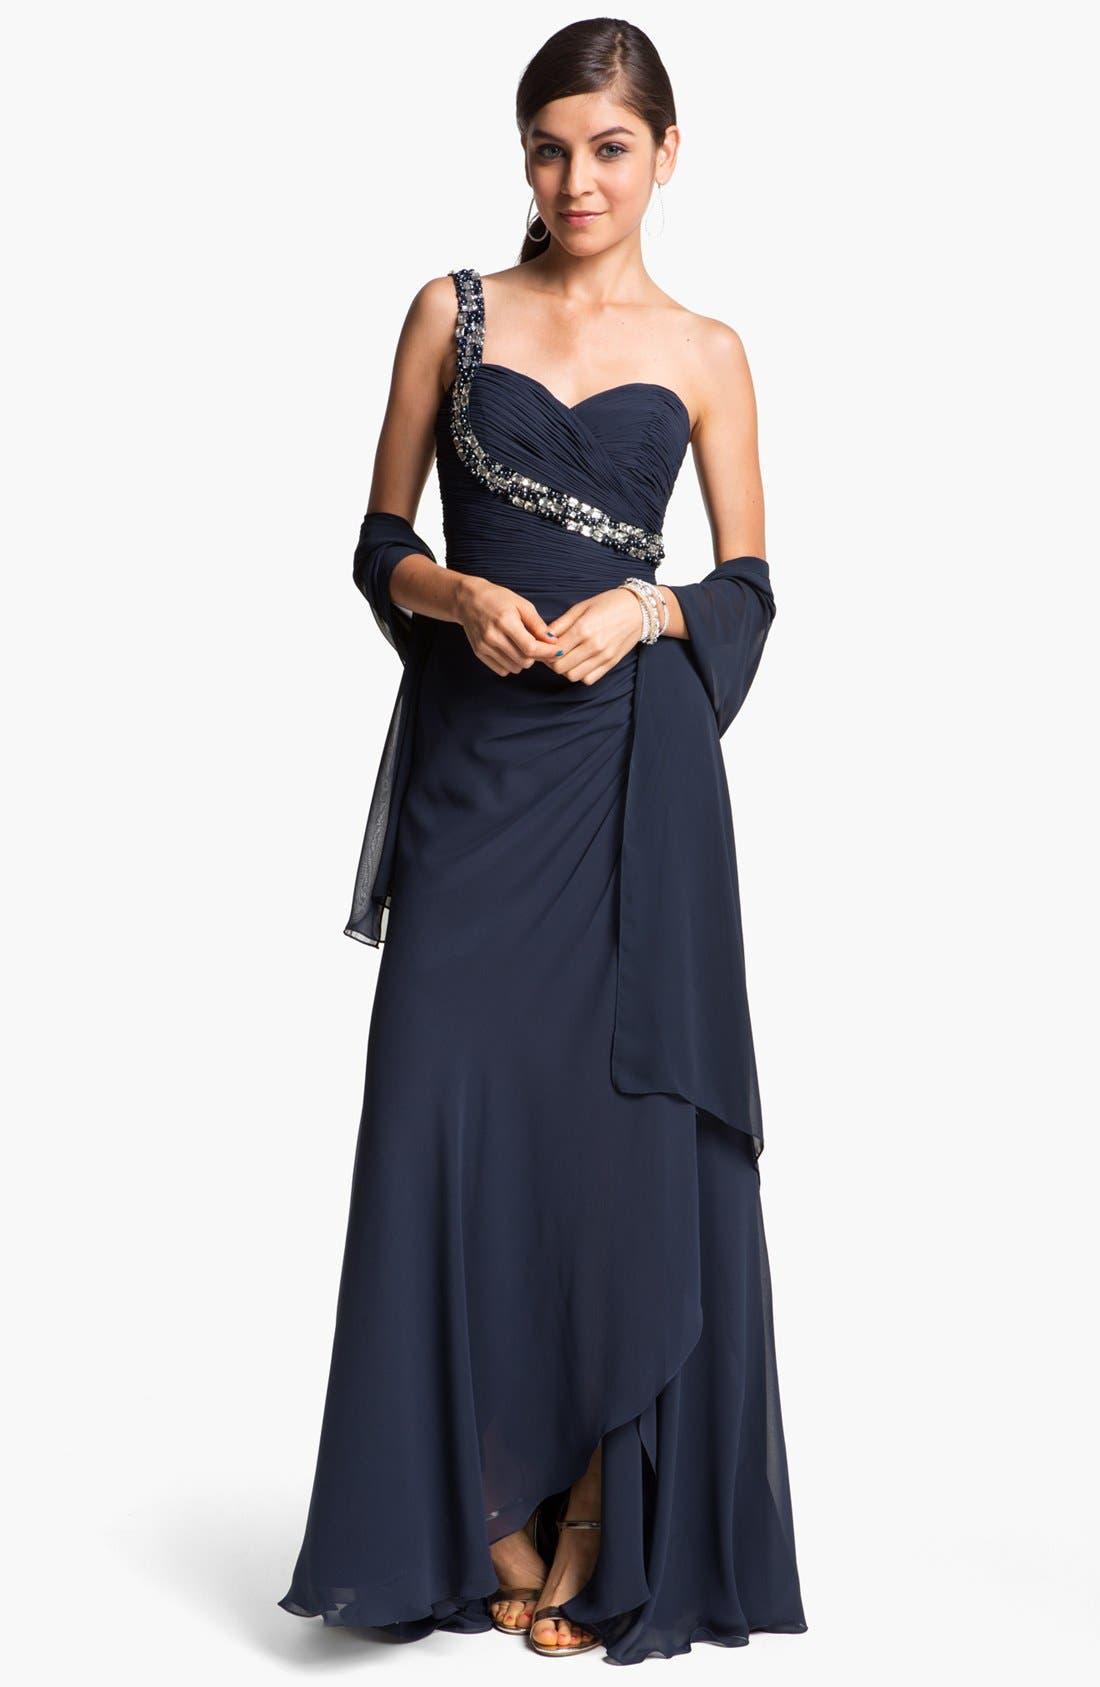 Main Image - Faviana Embellished One Shoulder Chiffon Gown & Shawl